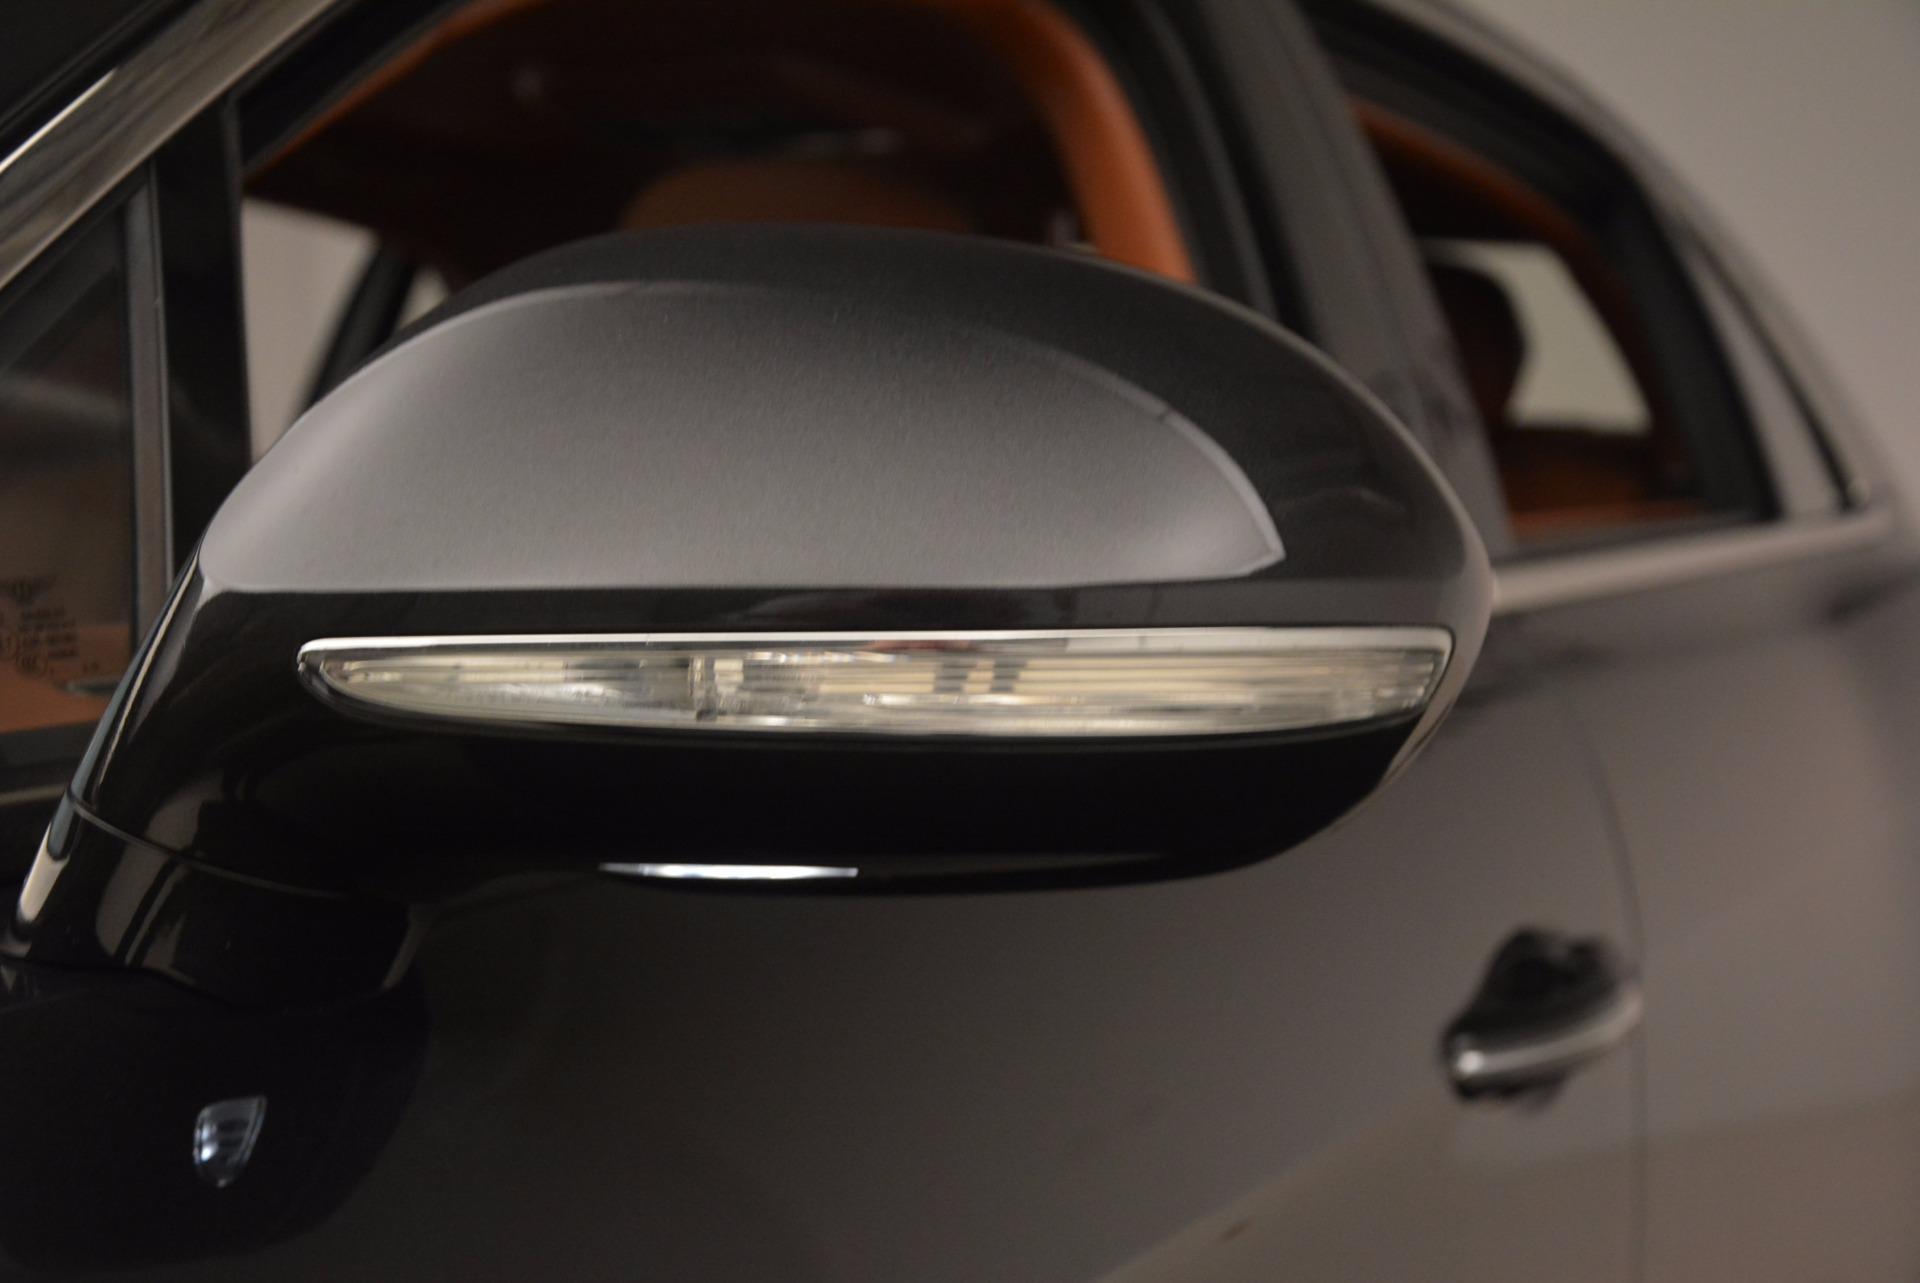 Used 2014 Bentley Flying Spur W12 For Sale In Westport, CT 1598_p24